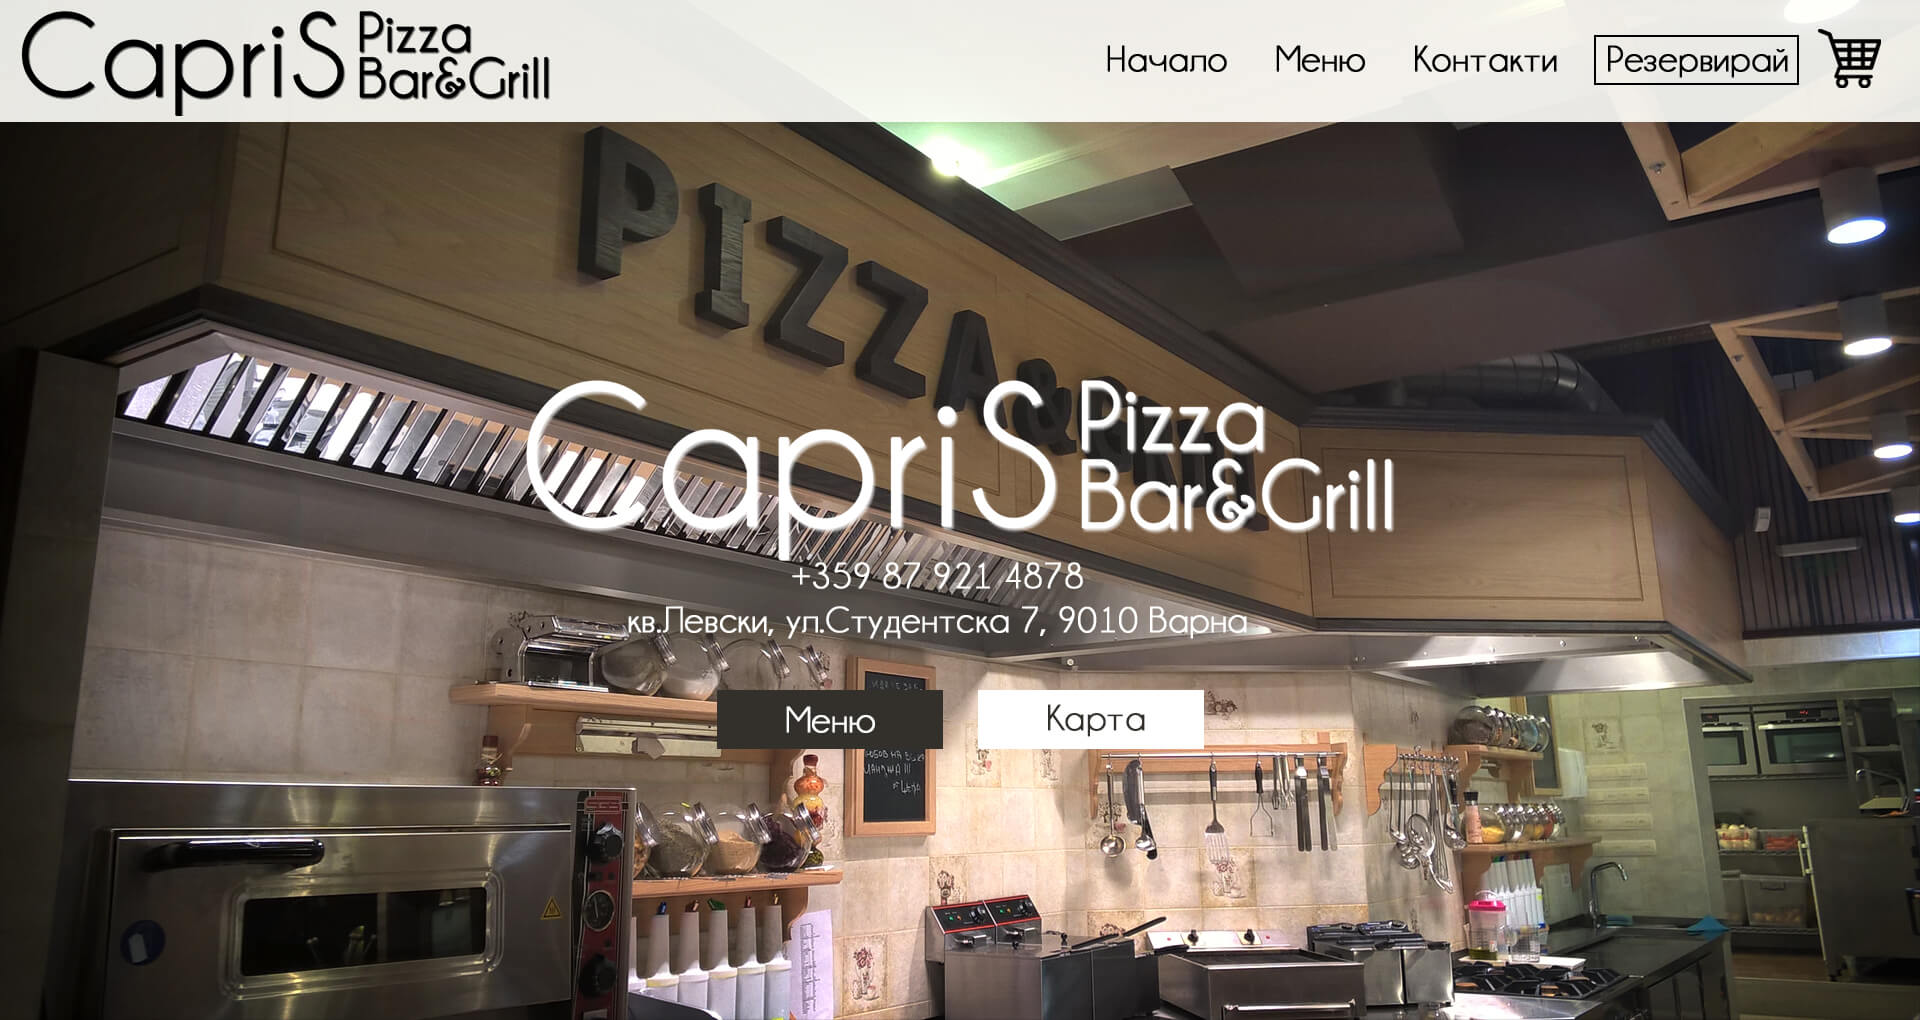 Pizza Bar Capris HomePage Cover Rosen Markov